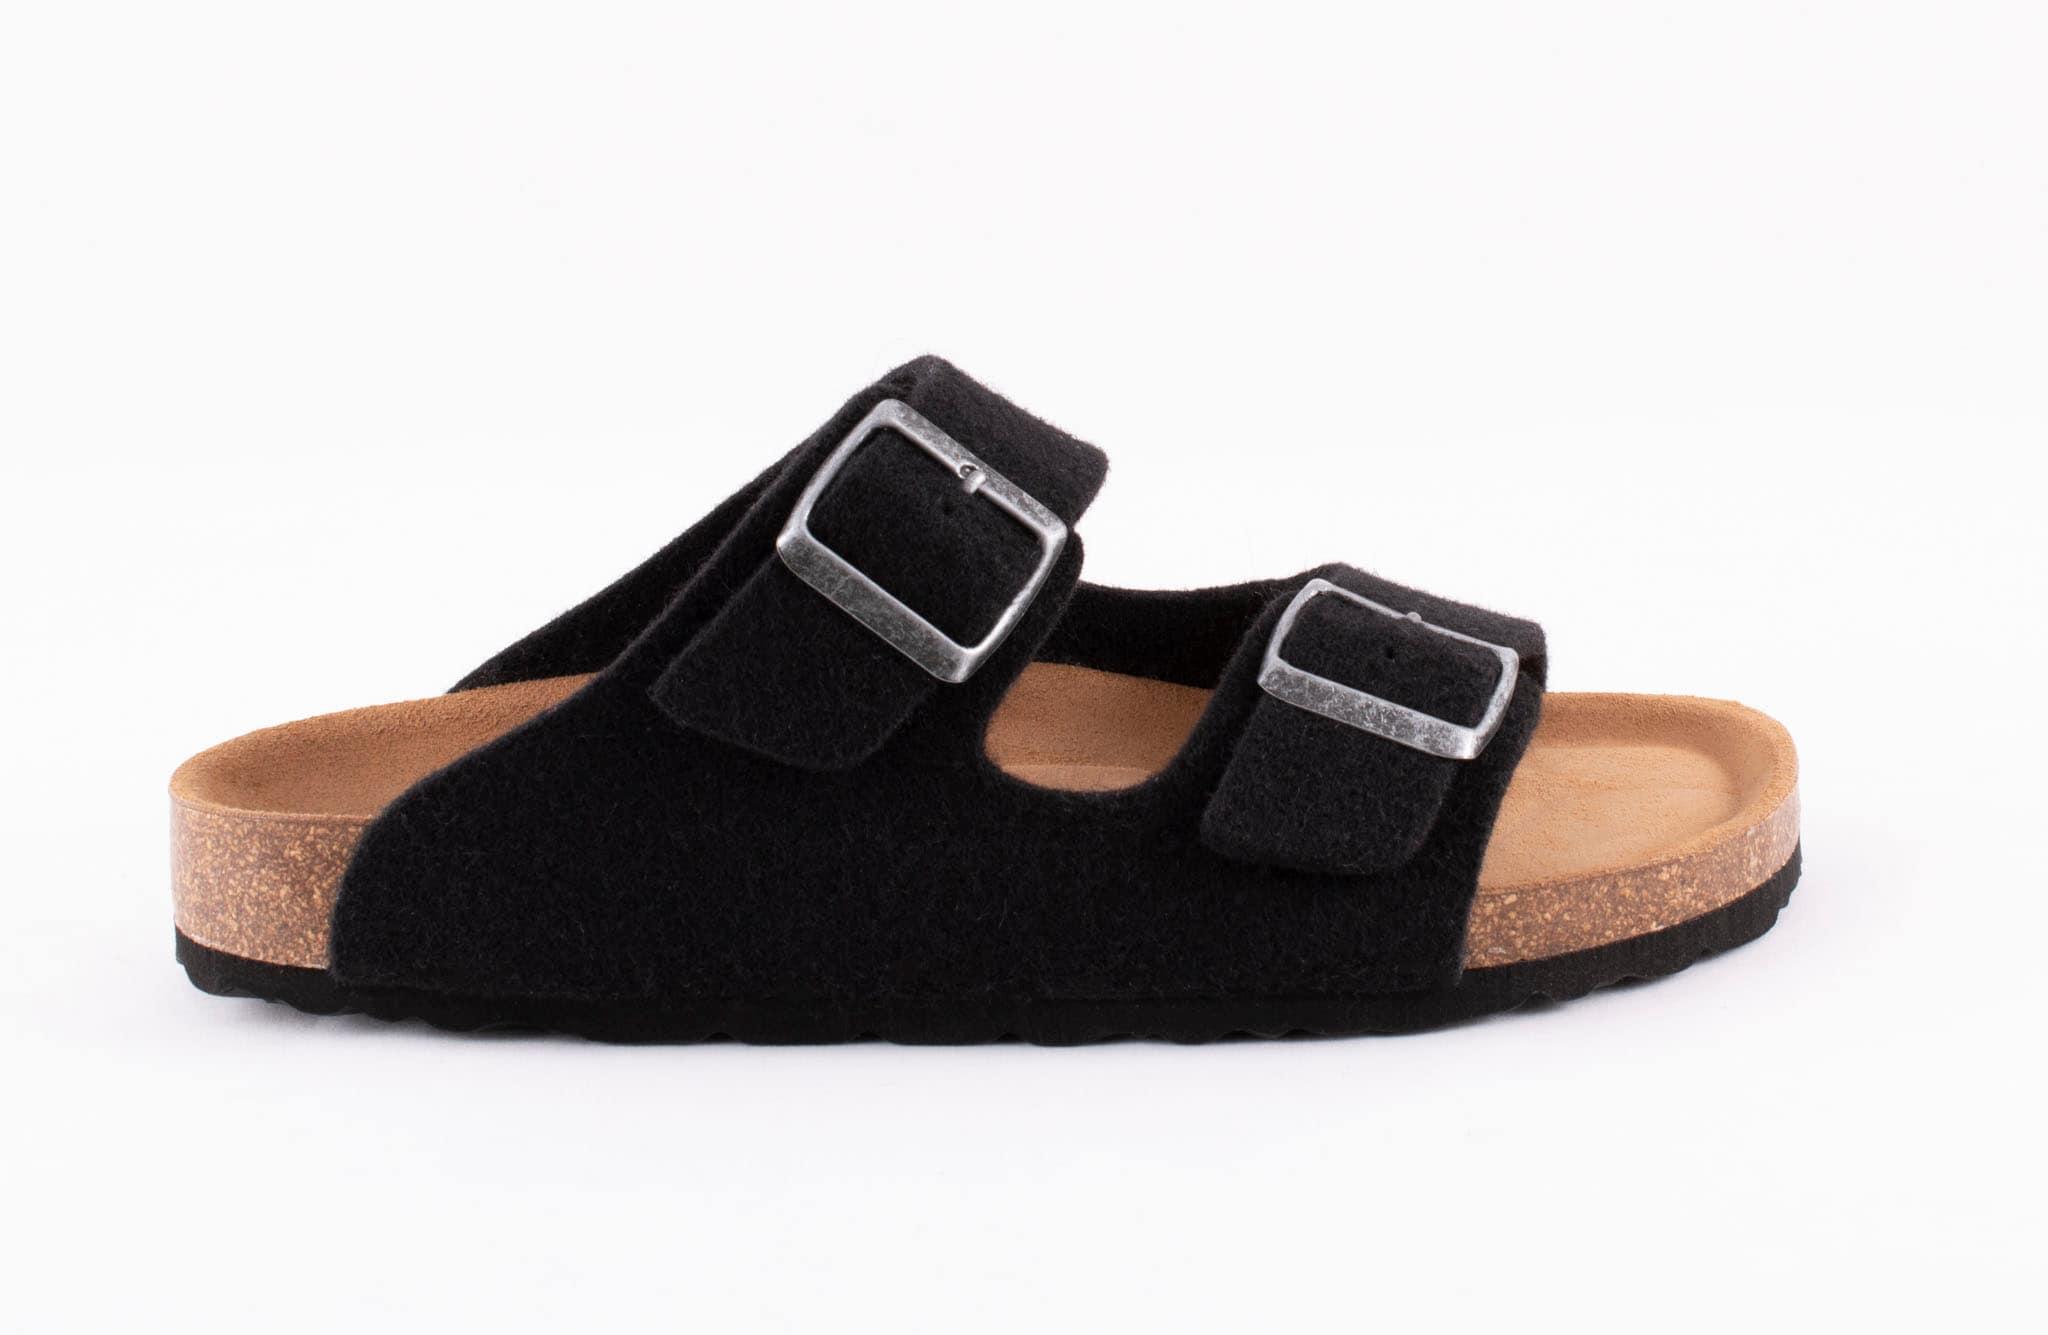 Mikael sandals